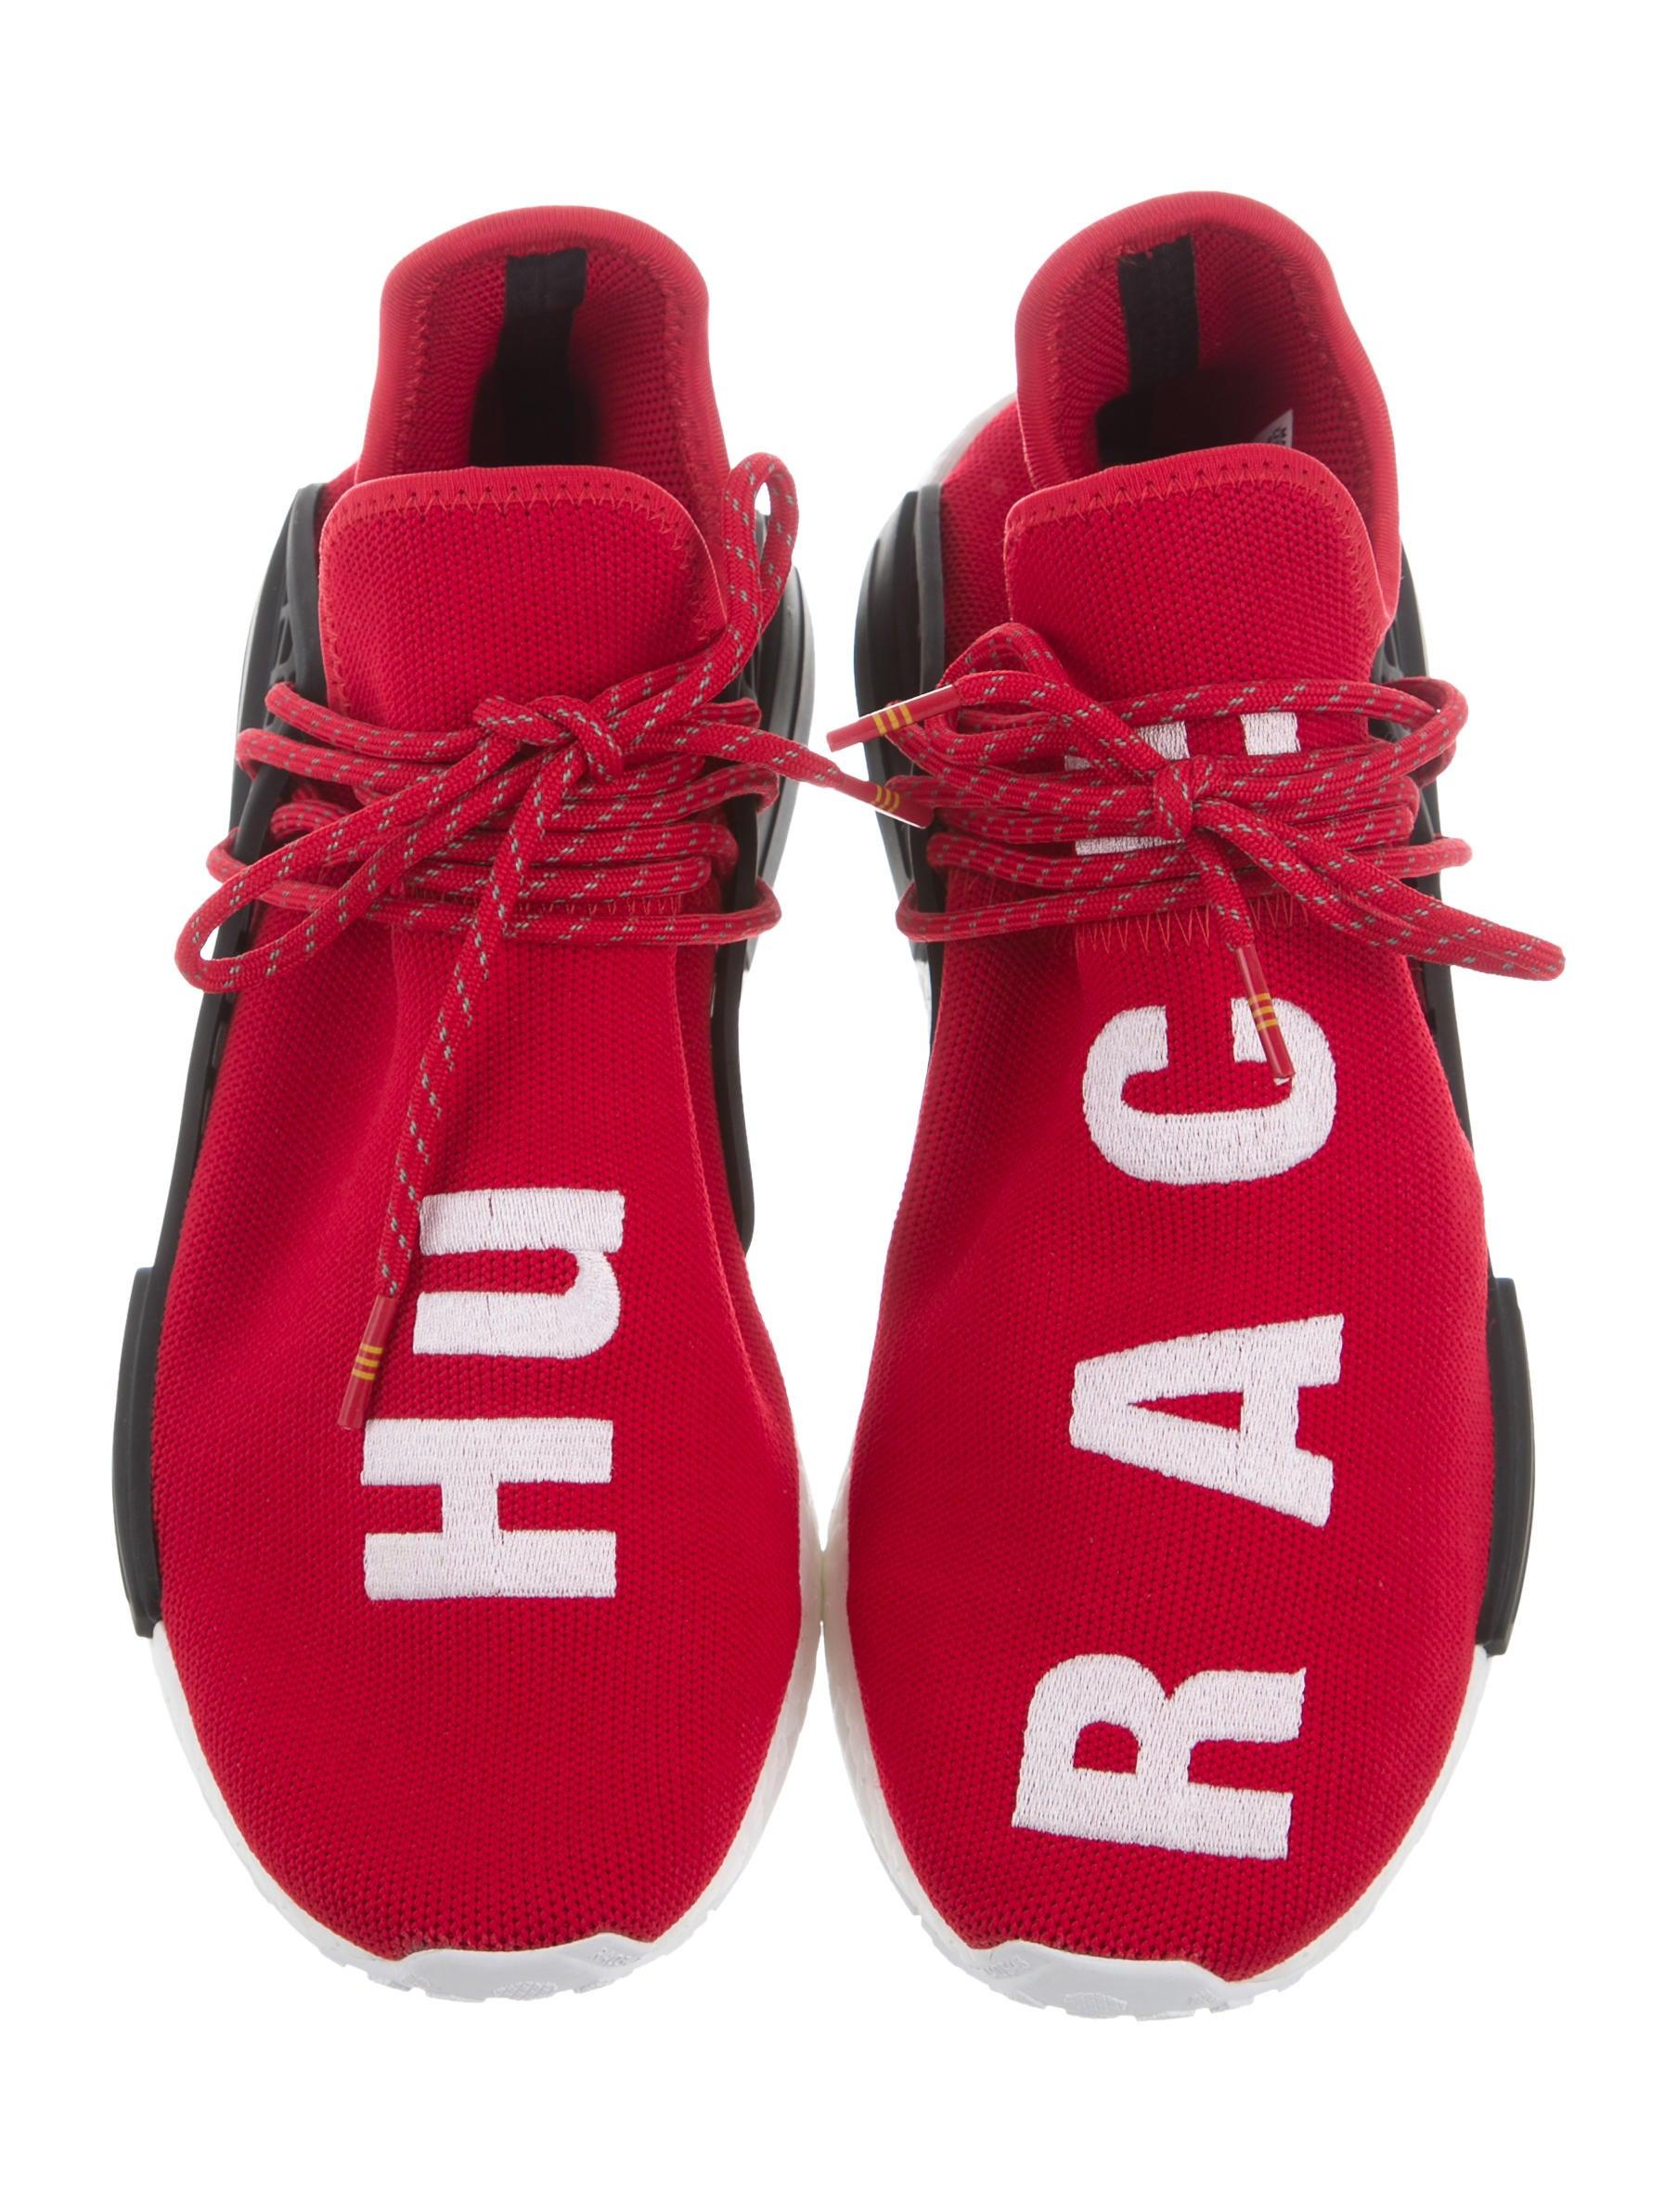 pharrell williams x adidas nmd hu razza umana scarpe, scarpe